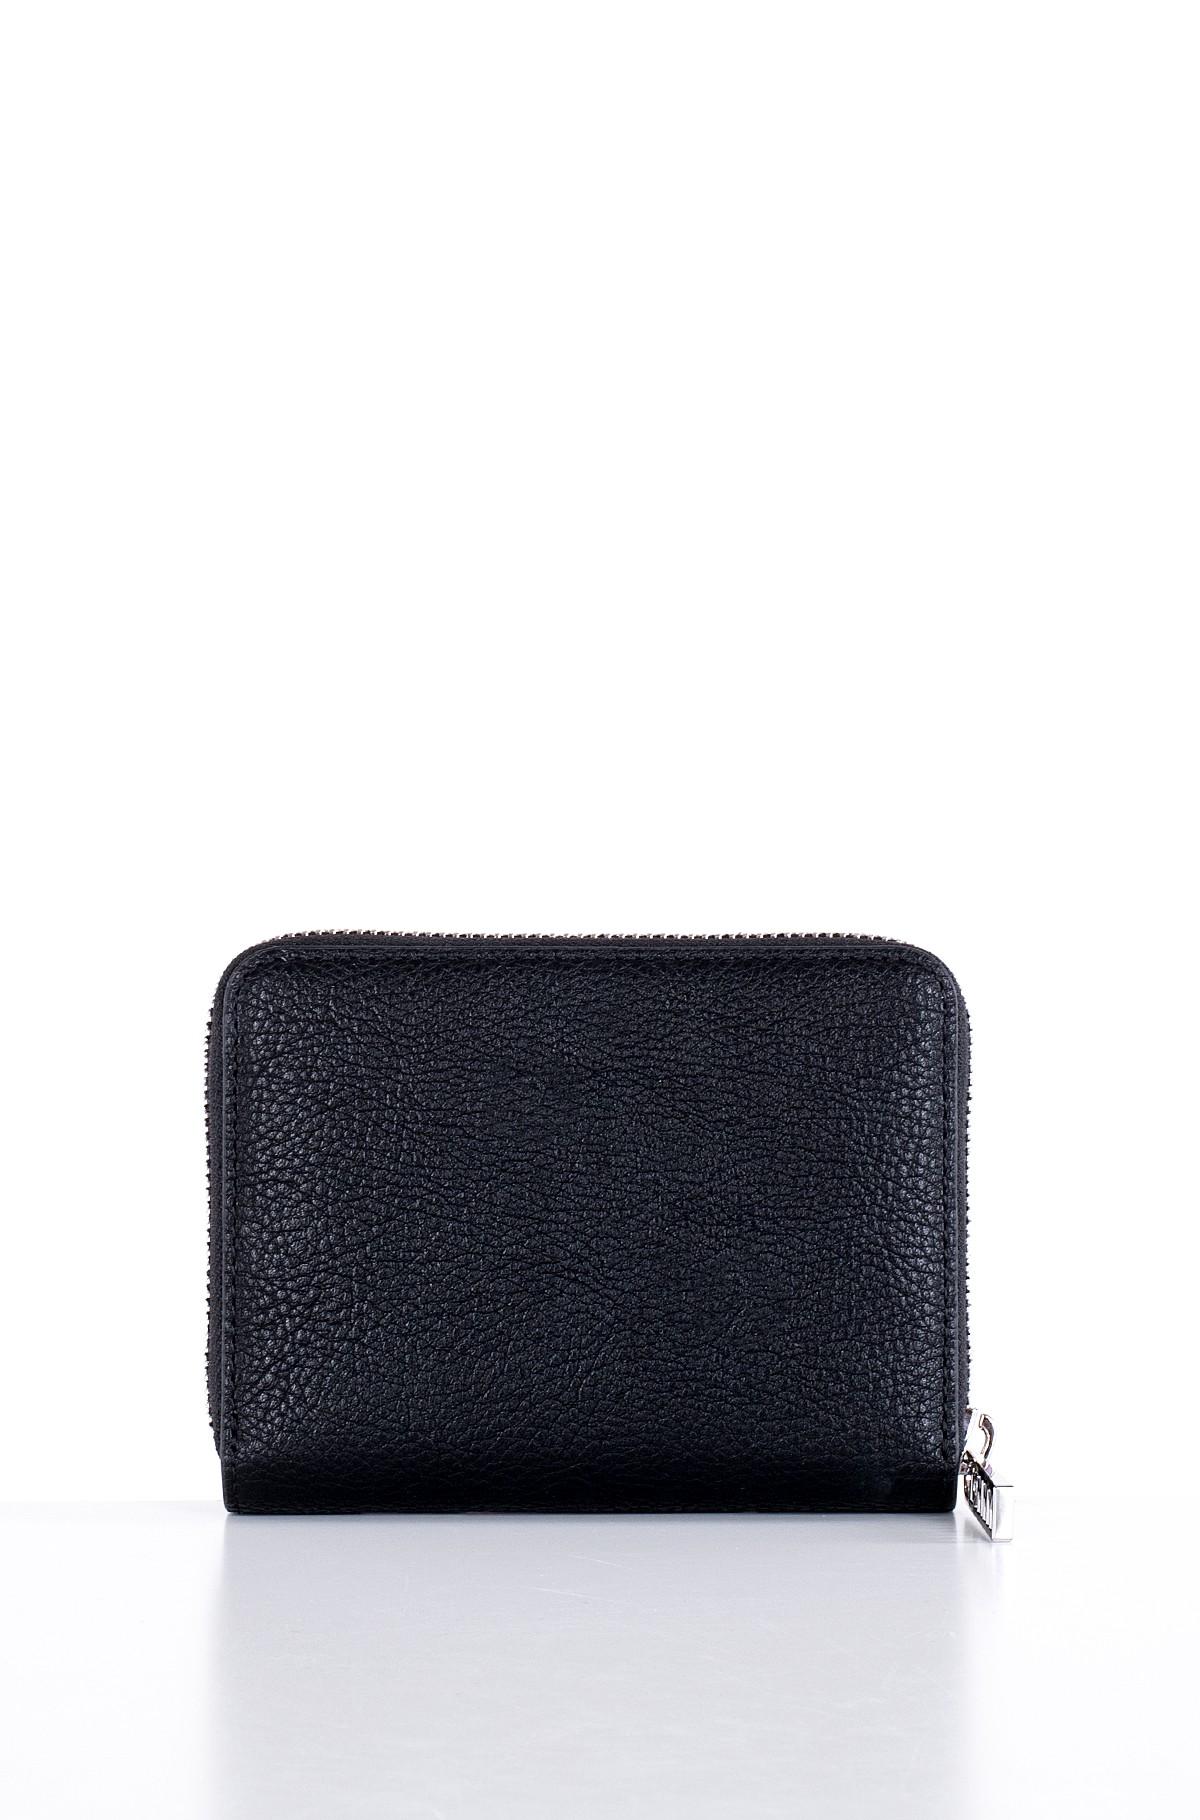 Wallet TH CORE MEDIUM ZA-full-2